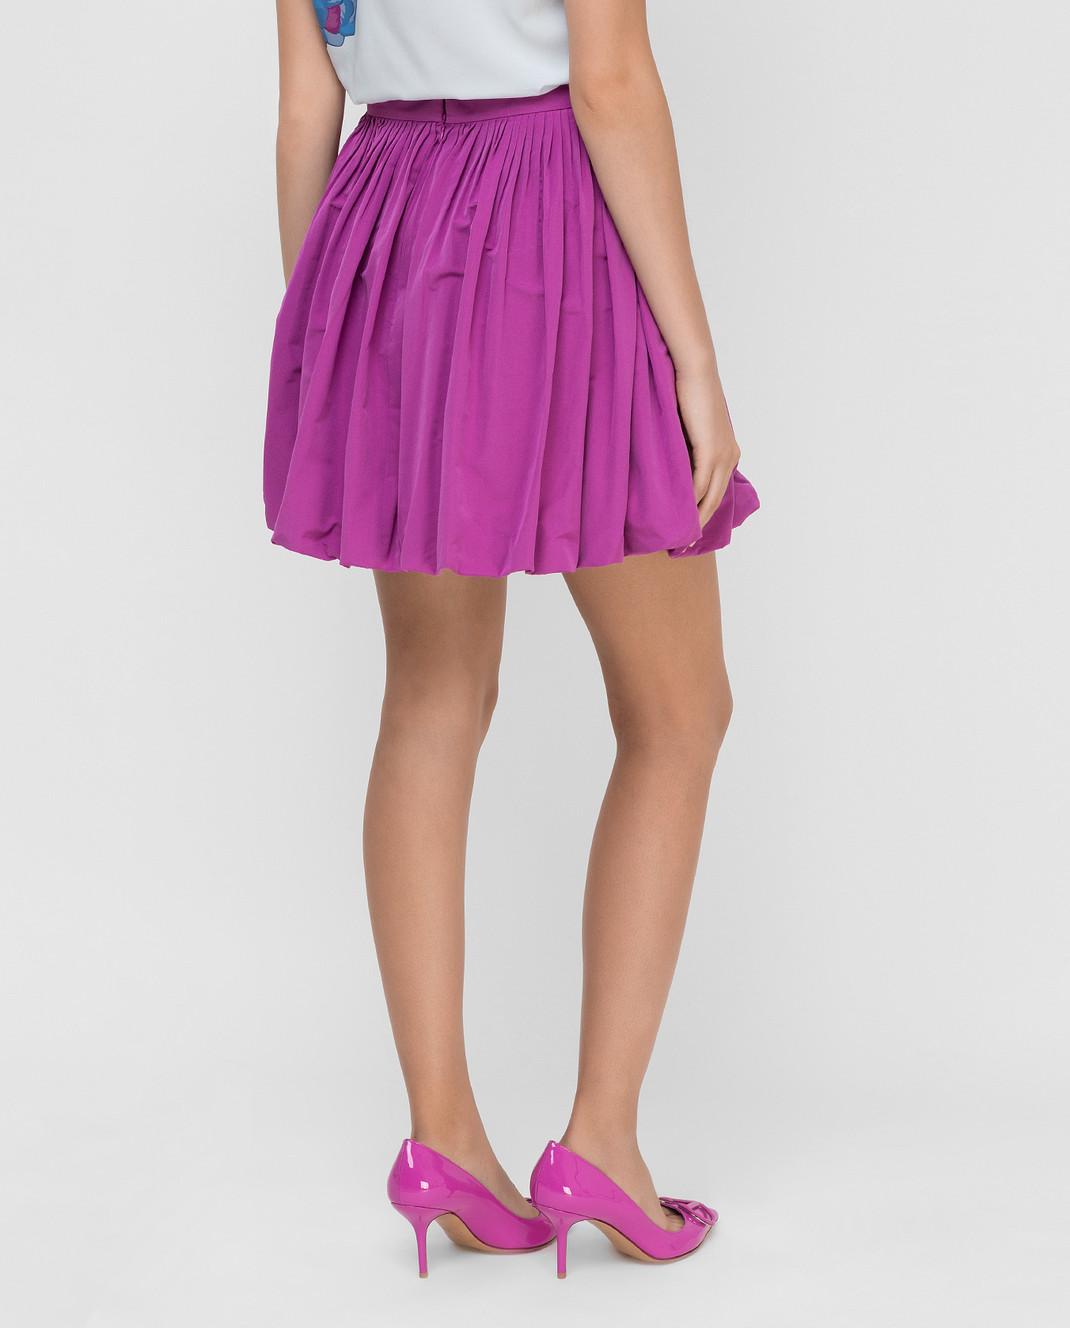 Valentino Сиреневая юбка изображение 4